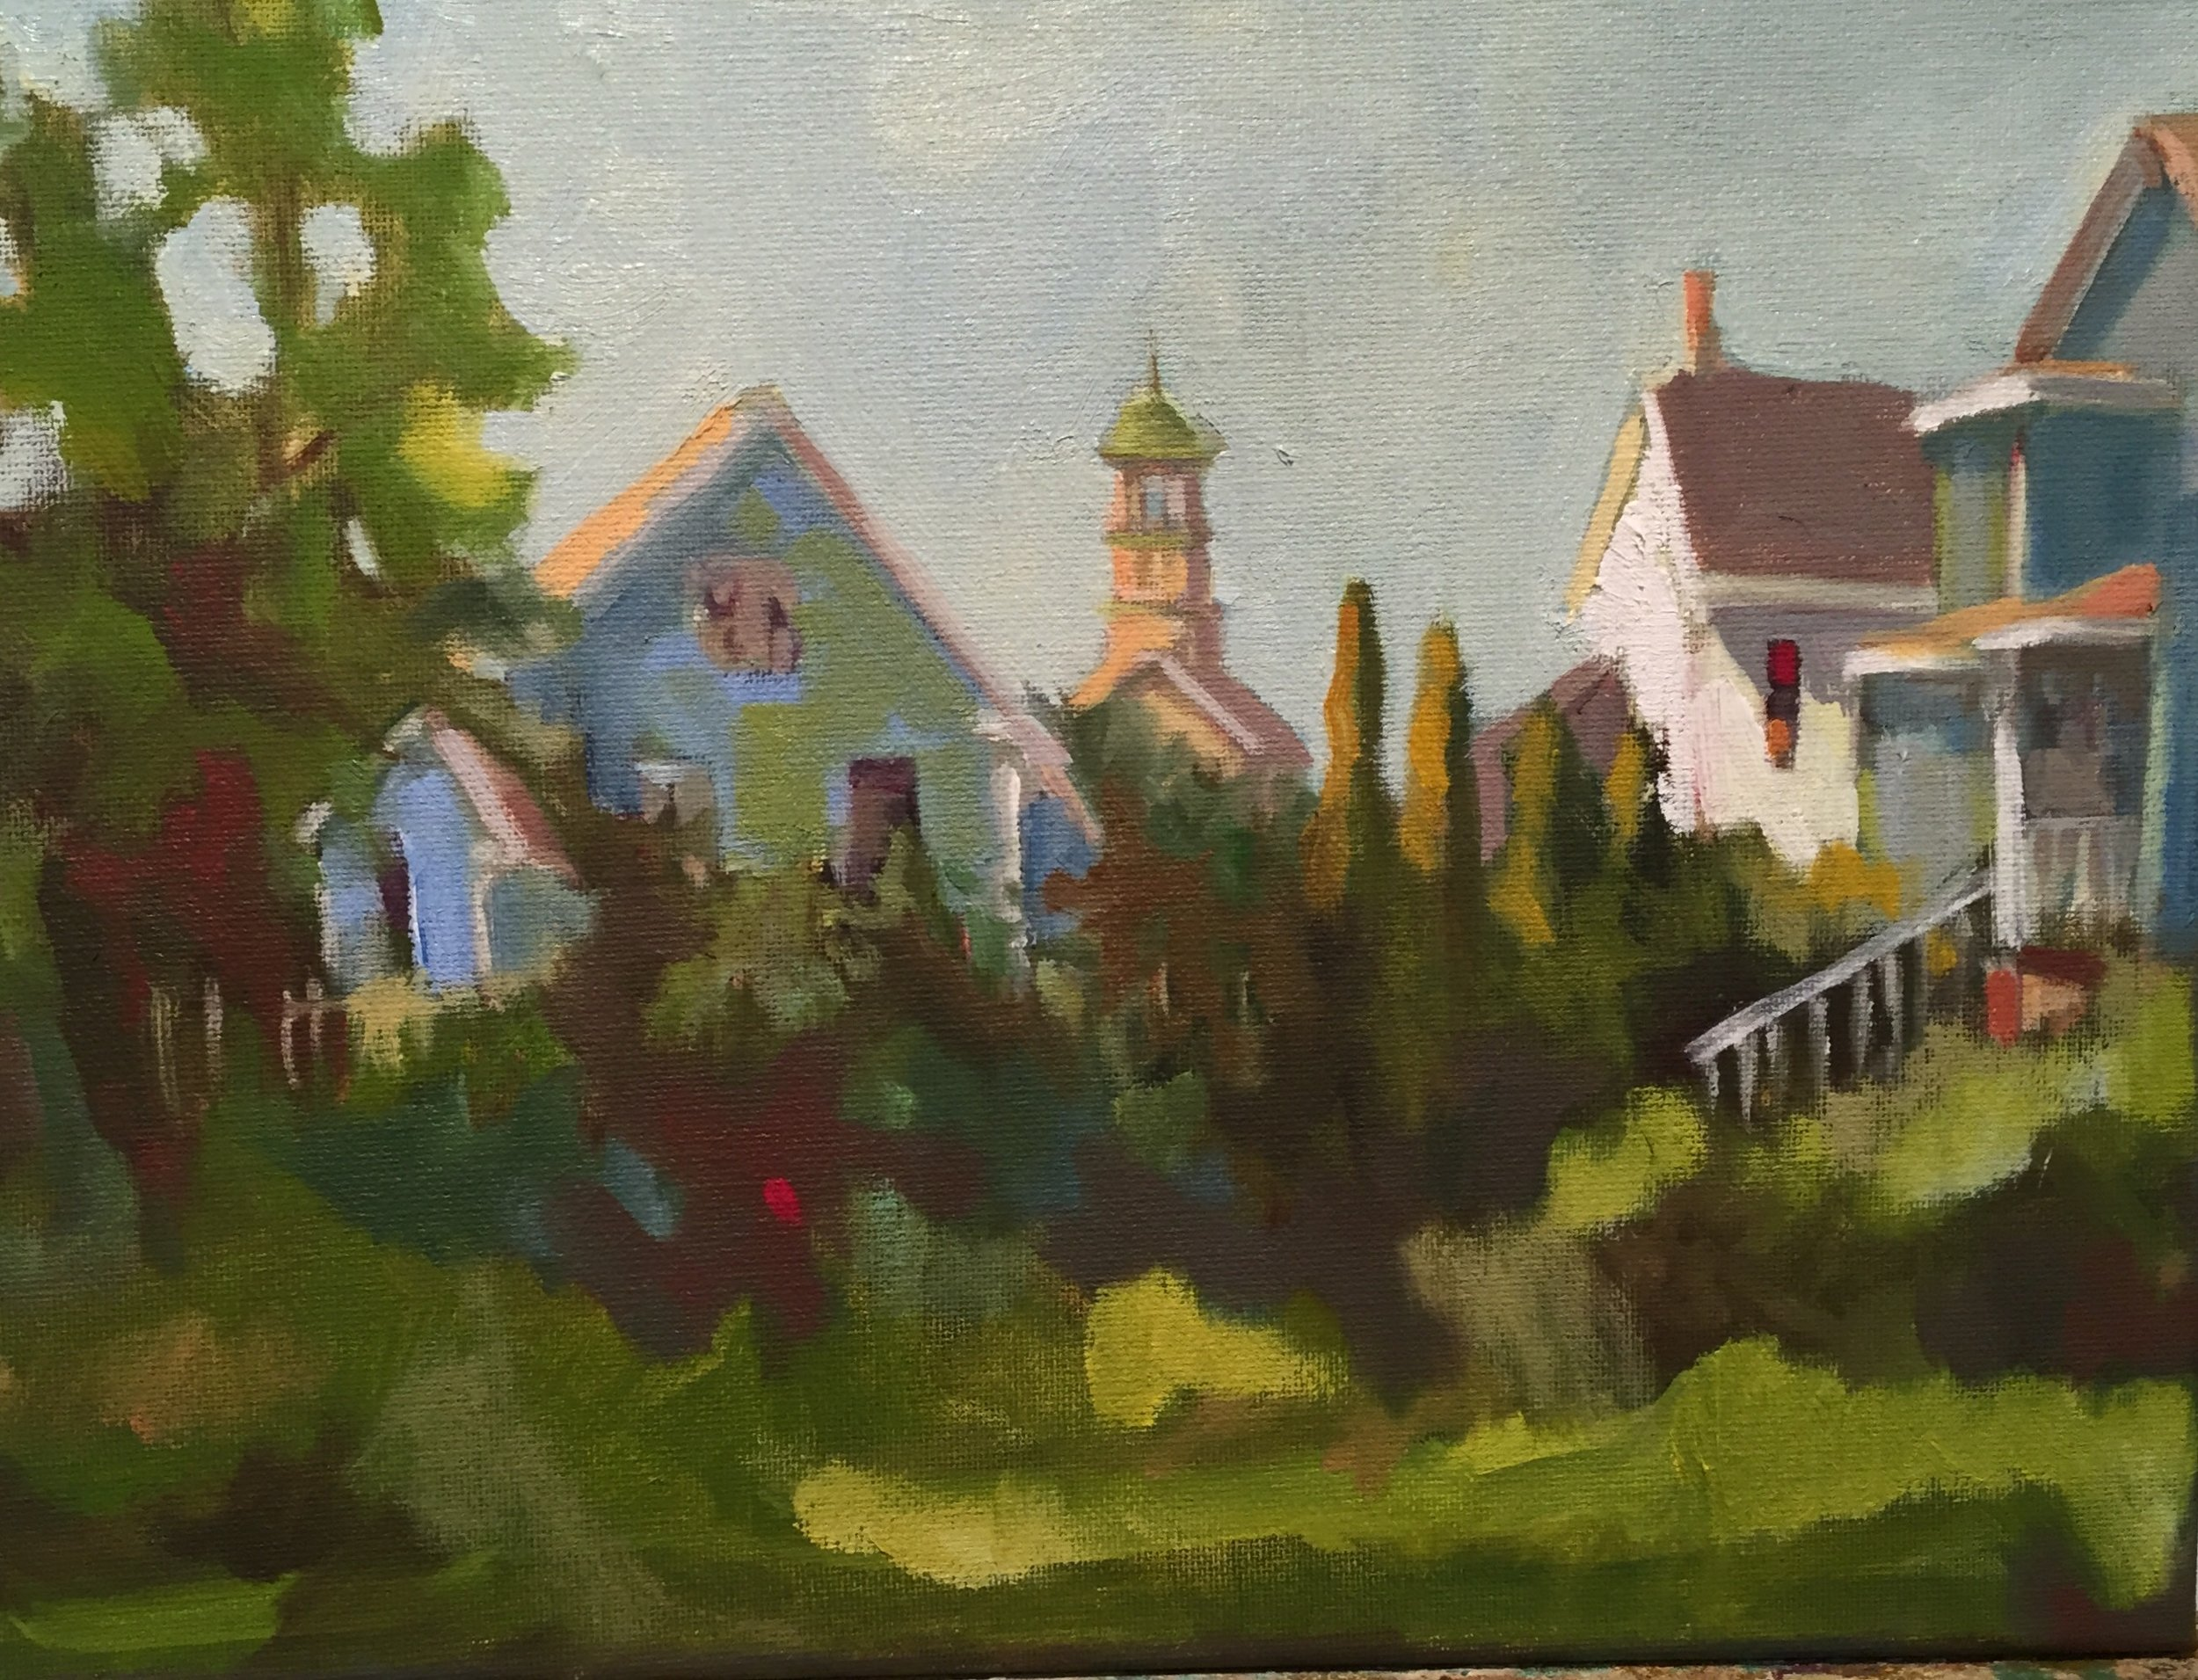 South End, oils, 9 x 12